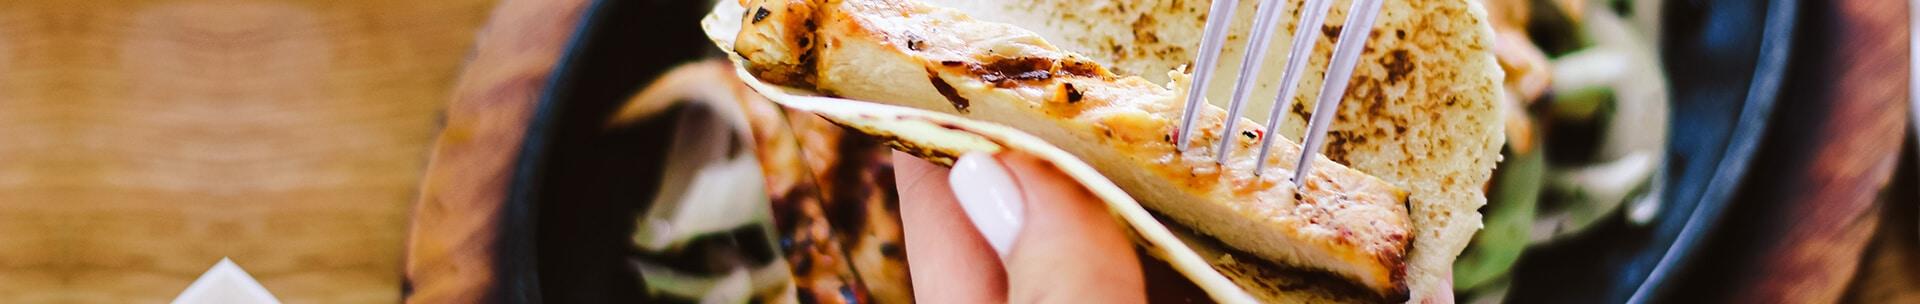 Mexican Restaurant- ElRincontx.com